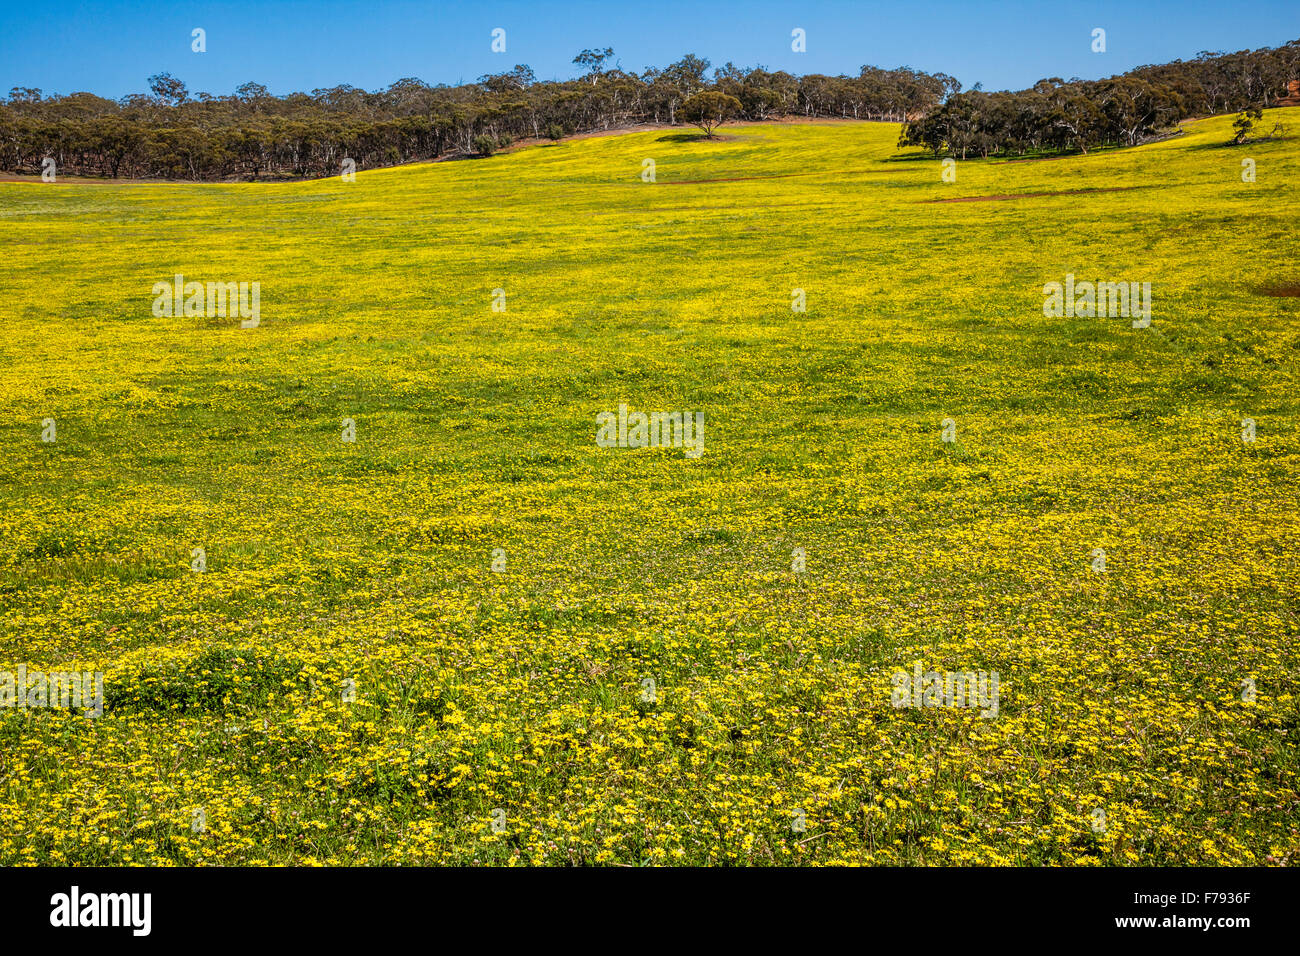 Australia, Western Australia, Wheatbelt Region, Shire of Victoria Plains, carpet of Cape Weed daisies - Stock Image